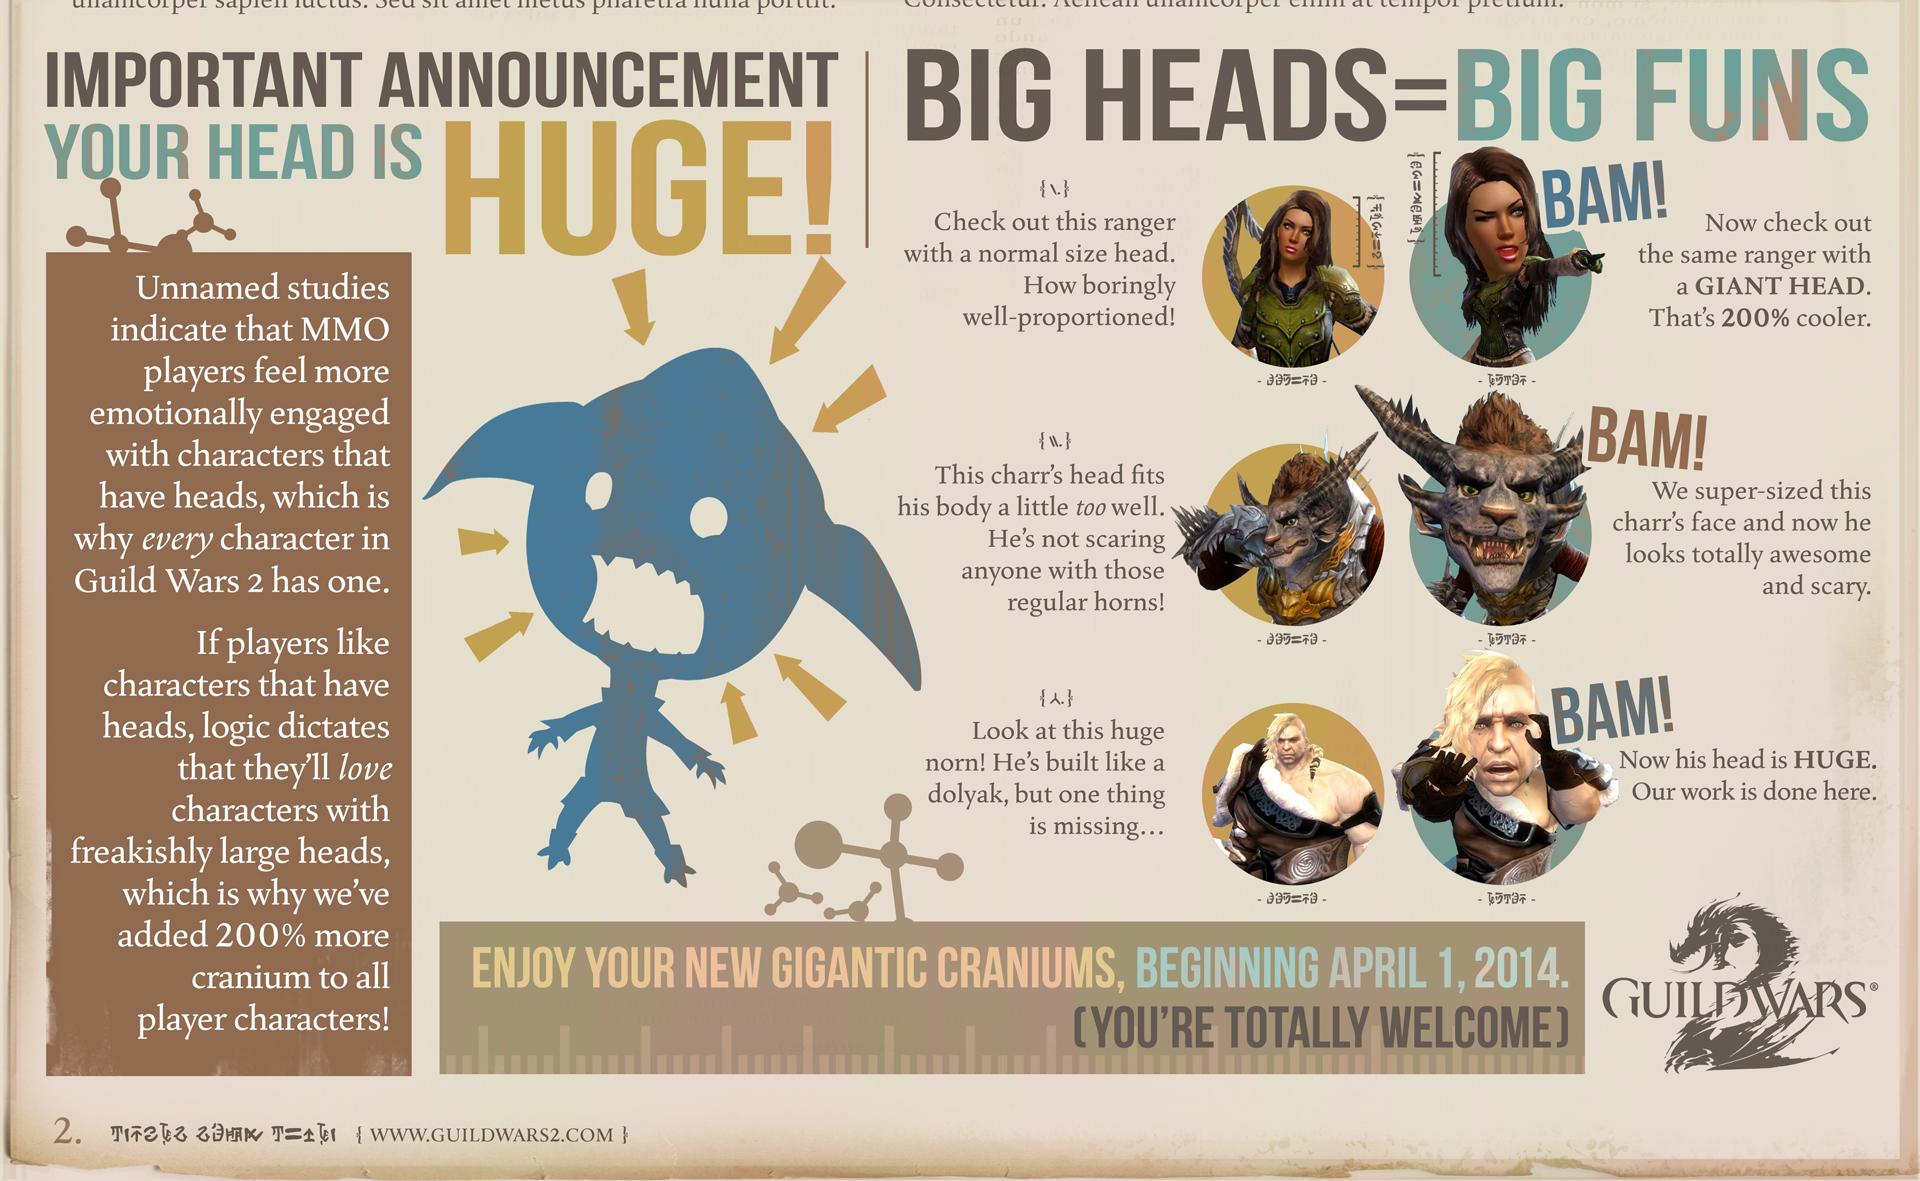 April Fools' brings big, bobblin' noggins to Guild Wars 2